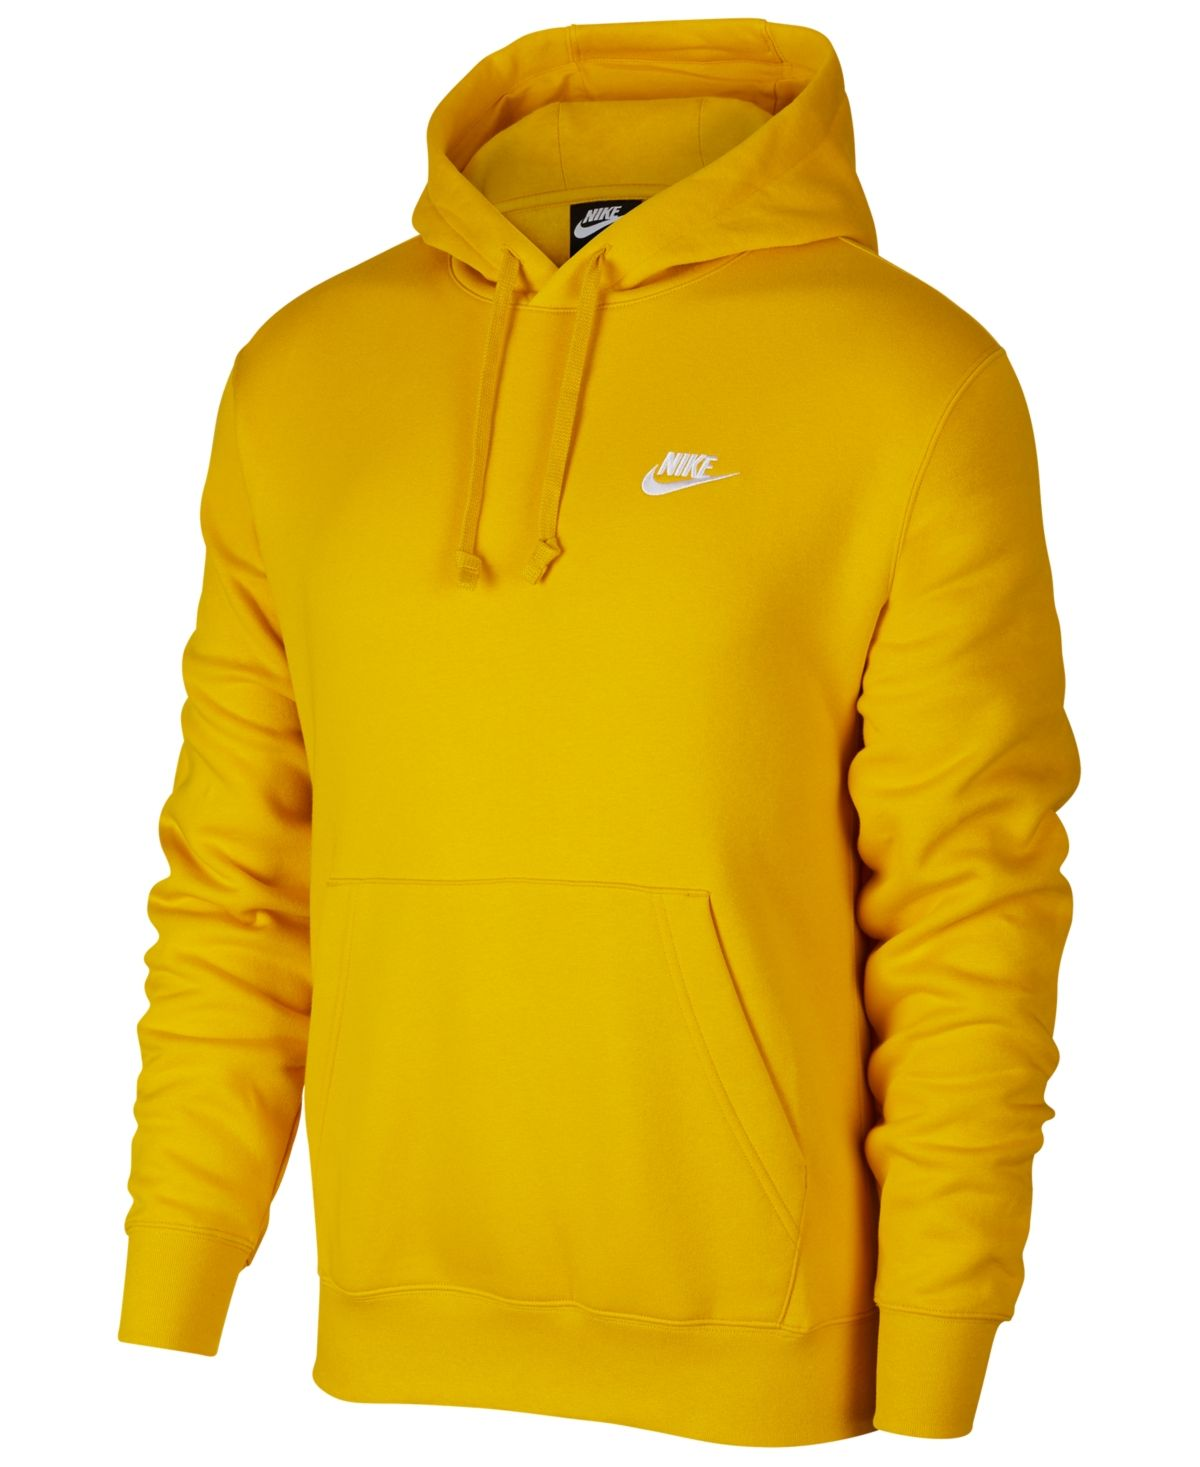 Nike Men S Sportswear Club Fleece Pullover Hoodie Reviews All Activewear Men Macy S Mens Sportswear Mens Sweatshirts Hoodie Hoodies [ 1467 x 1200 Pixel ]